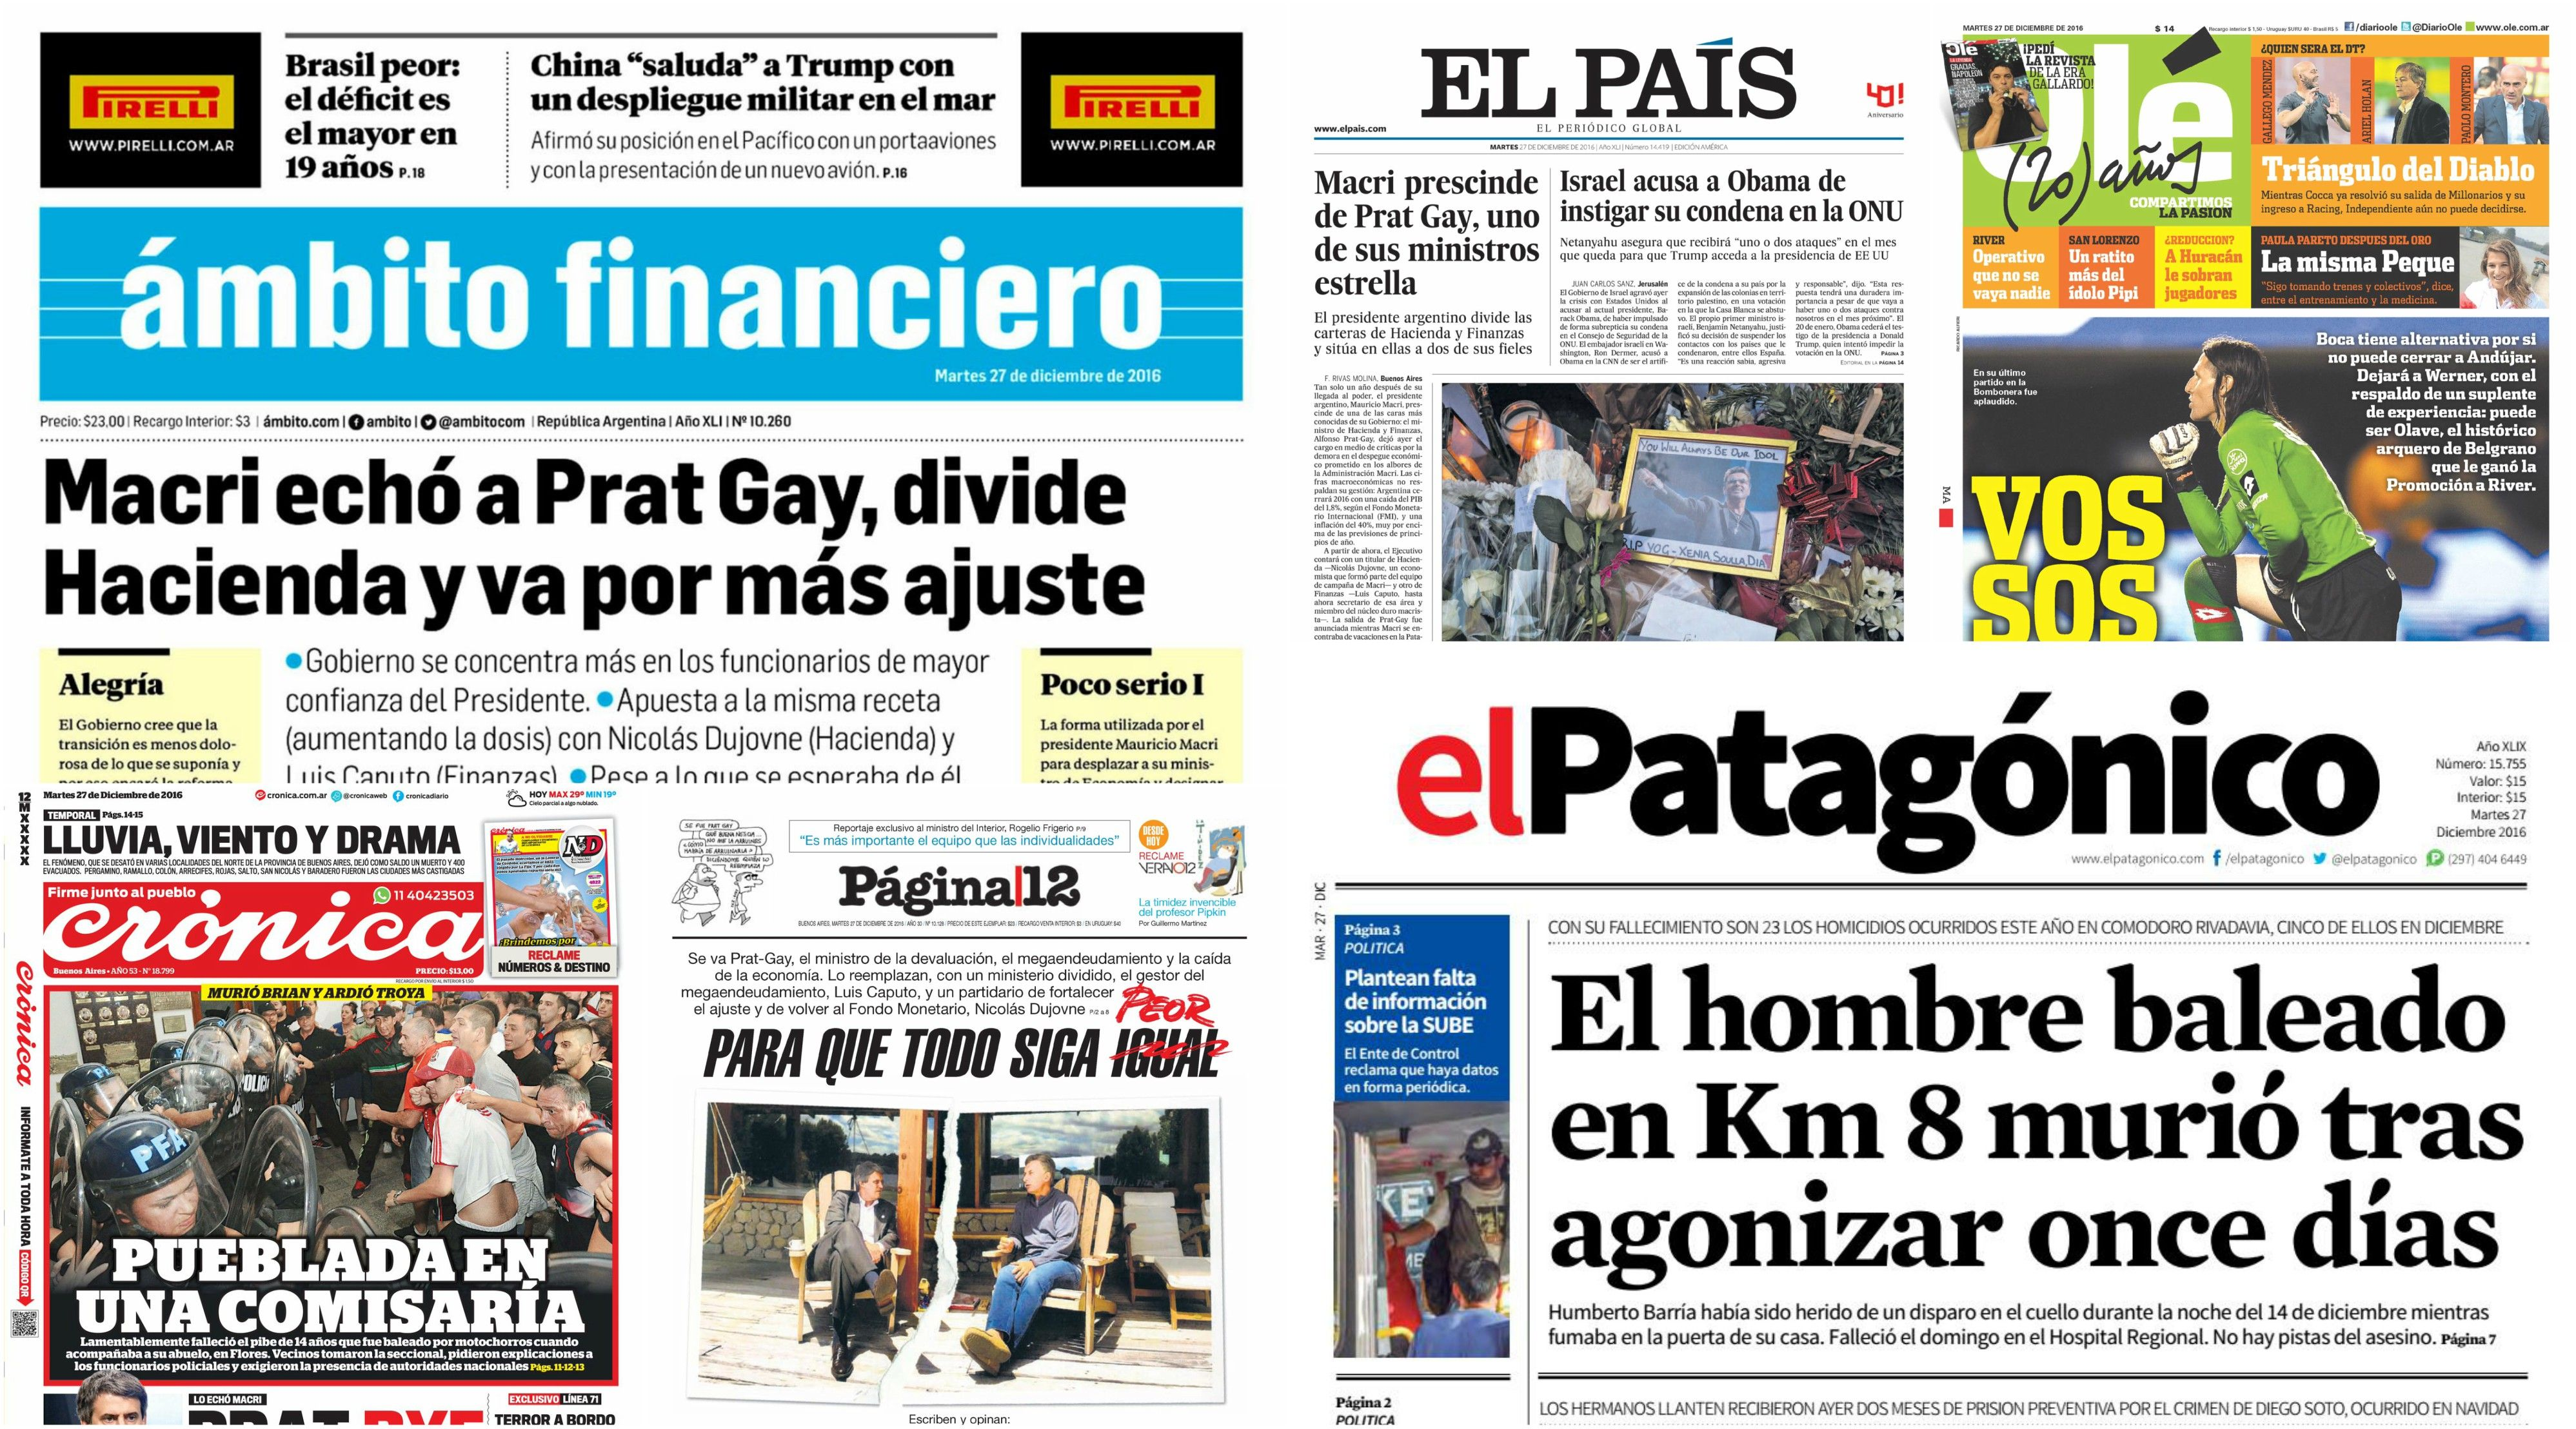 Tapas de diarios del 27 de diciembre de 2016